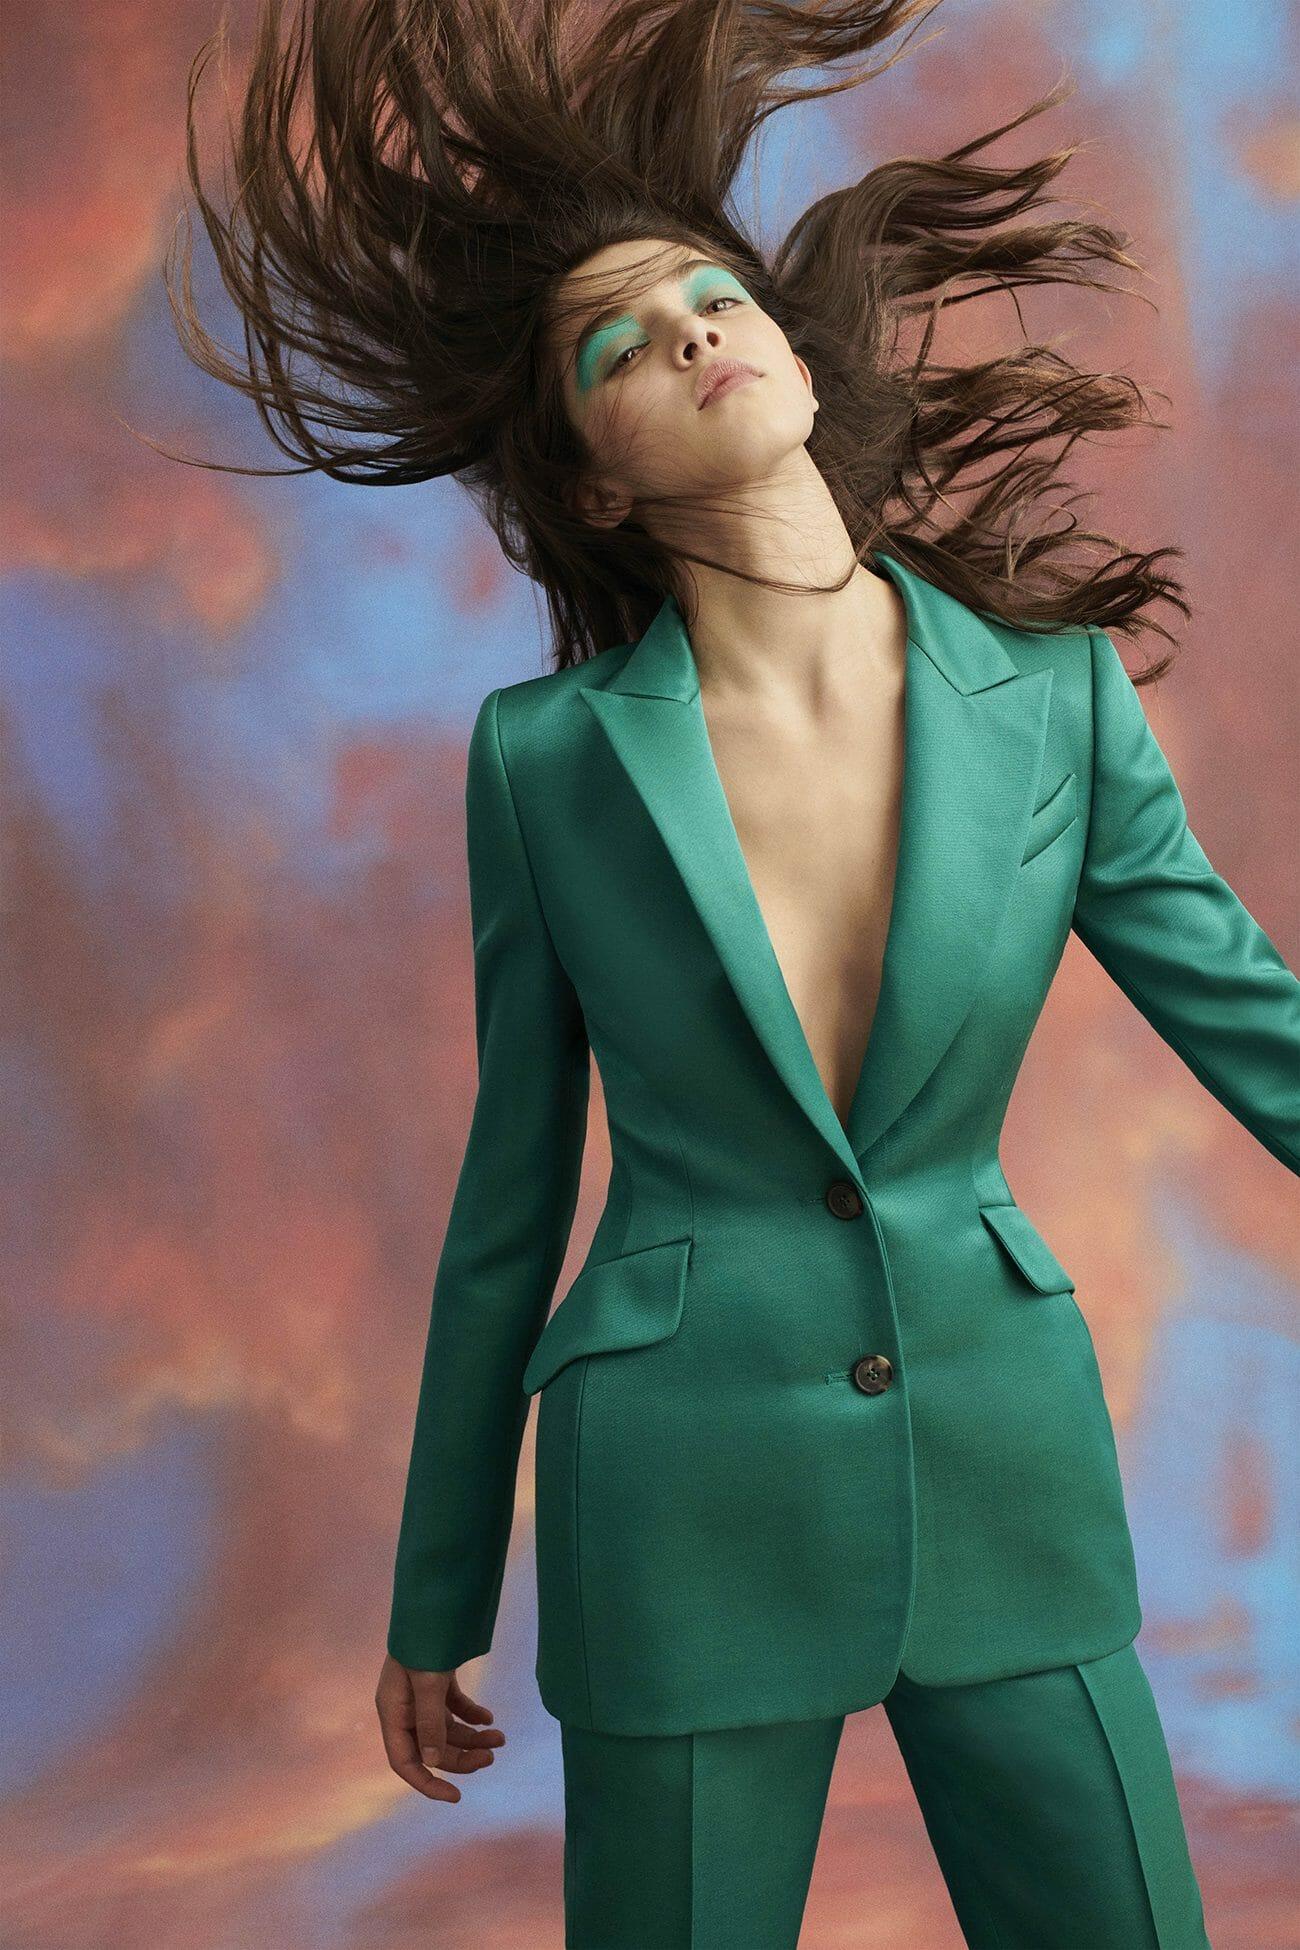 Carolina Herrera New York Ранняя осень 2019 - Образ 8